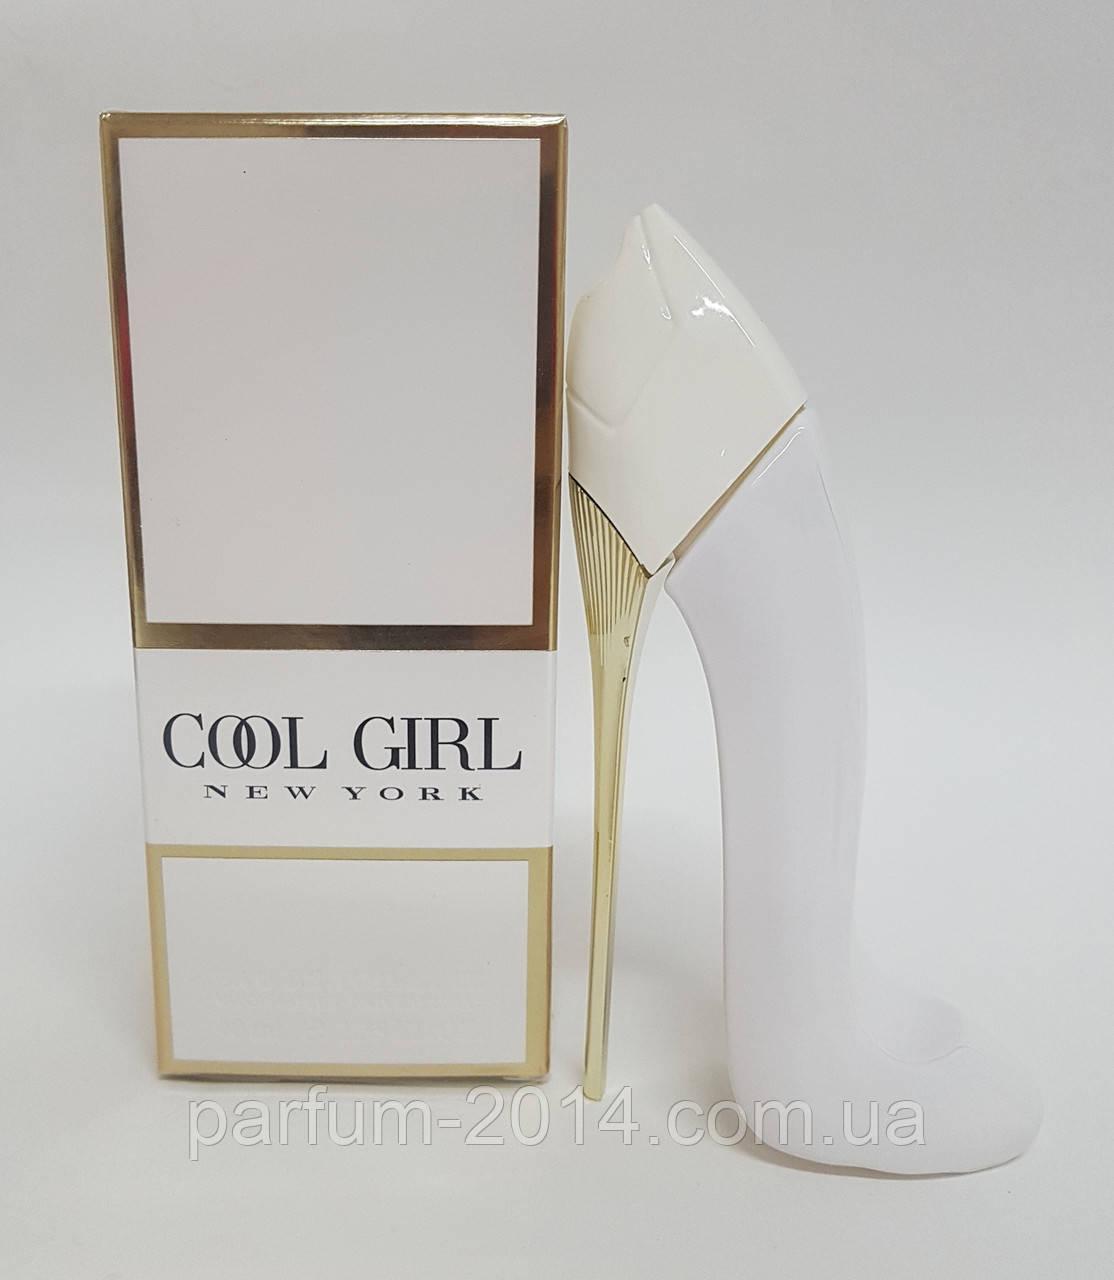 Мини парфюм Cool Girl White 40 ml (реплика)